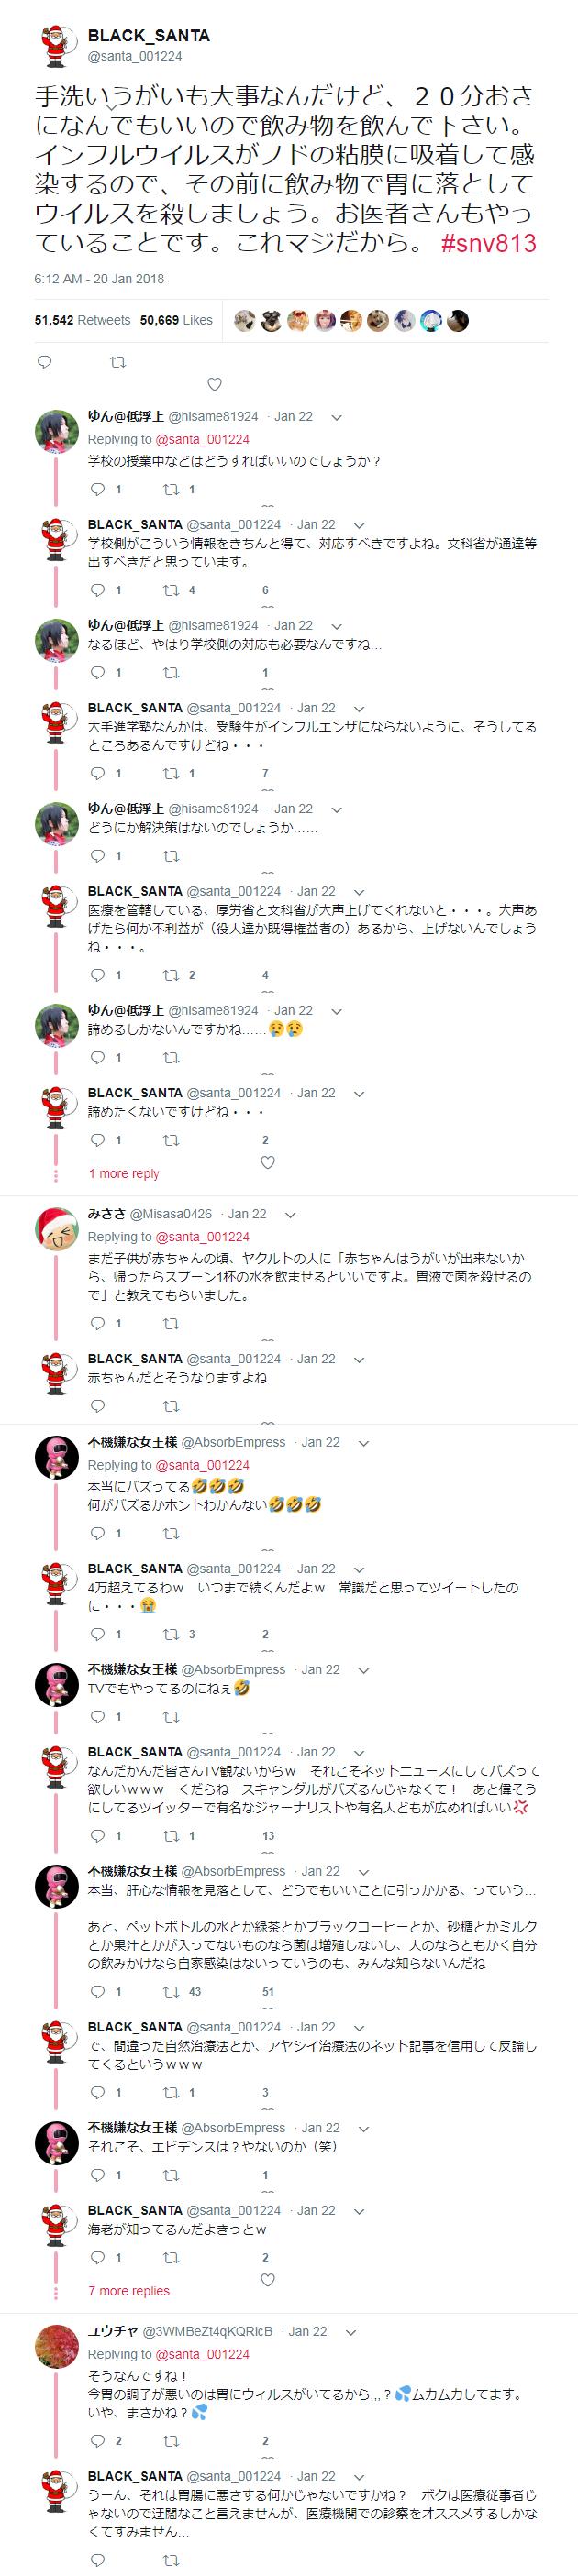 BLACK_SANTA on Twitter